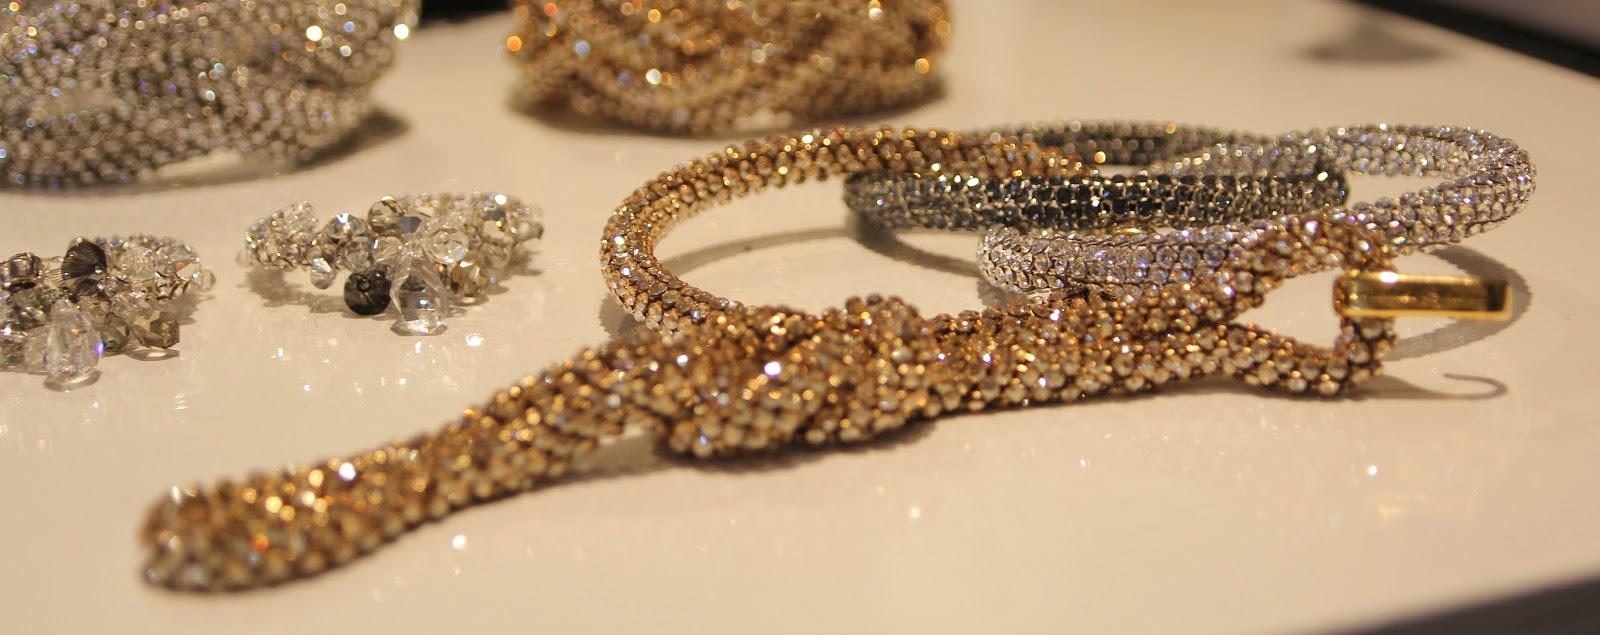 Job Opening For Bench Jeweler With Helzberg Diamonds (St ...